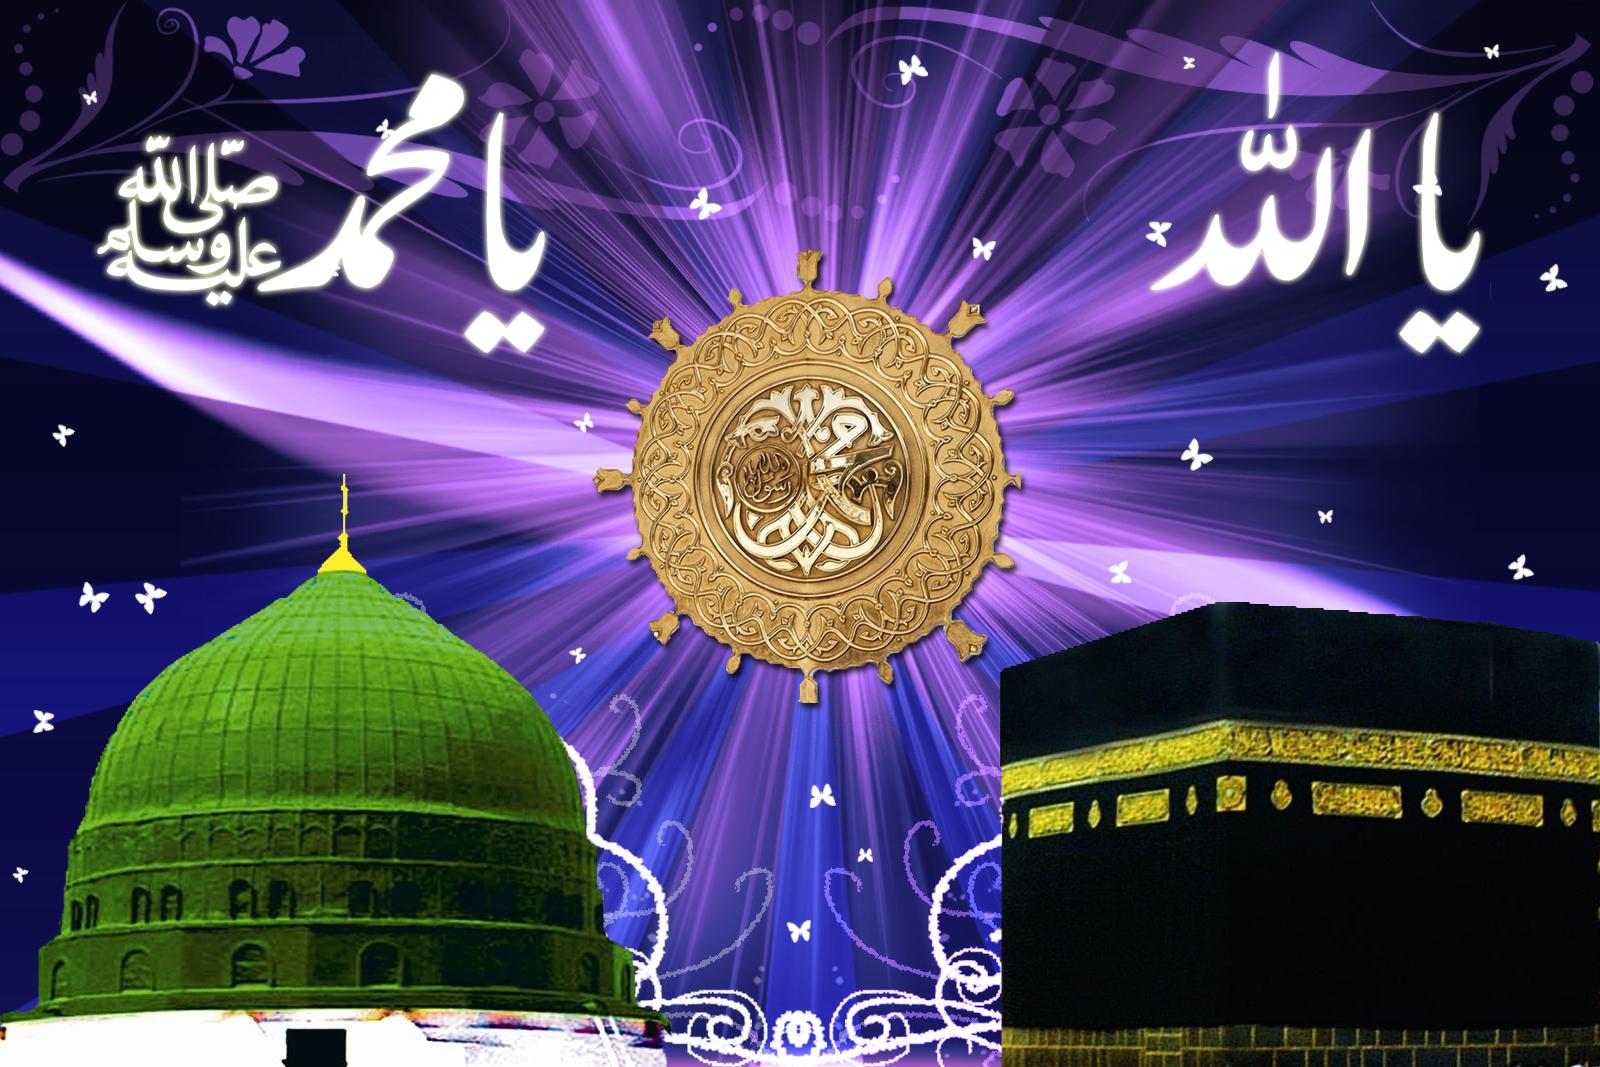 ya allah ya muhammad by murtuza1997-d39f1c8 jpg id 9632286Ya Allah Ya Muhammad Ya Ali Wallpapers